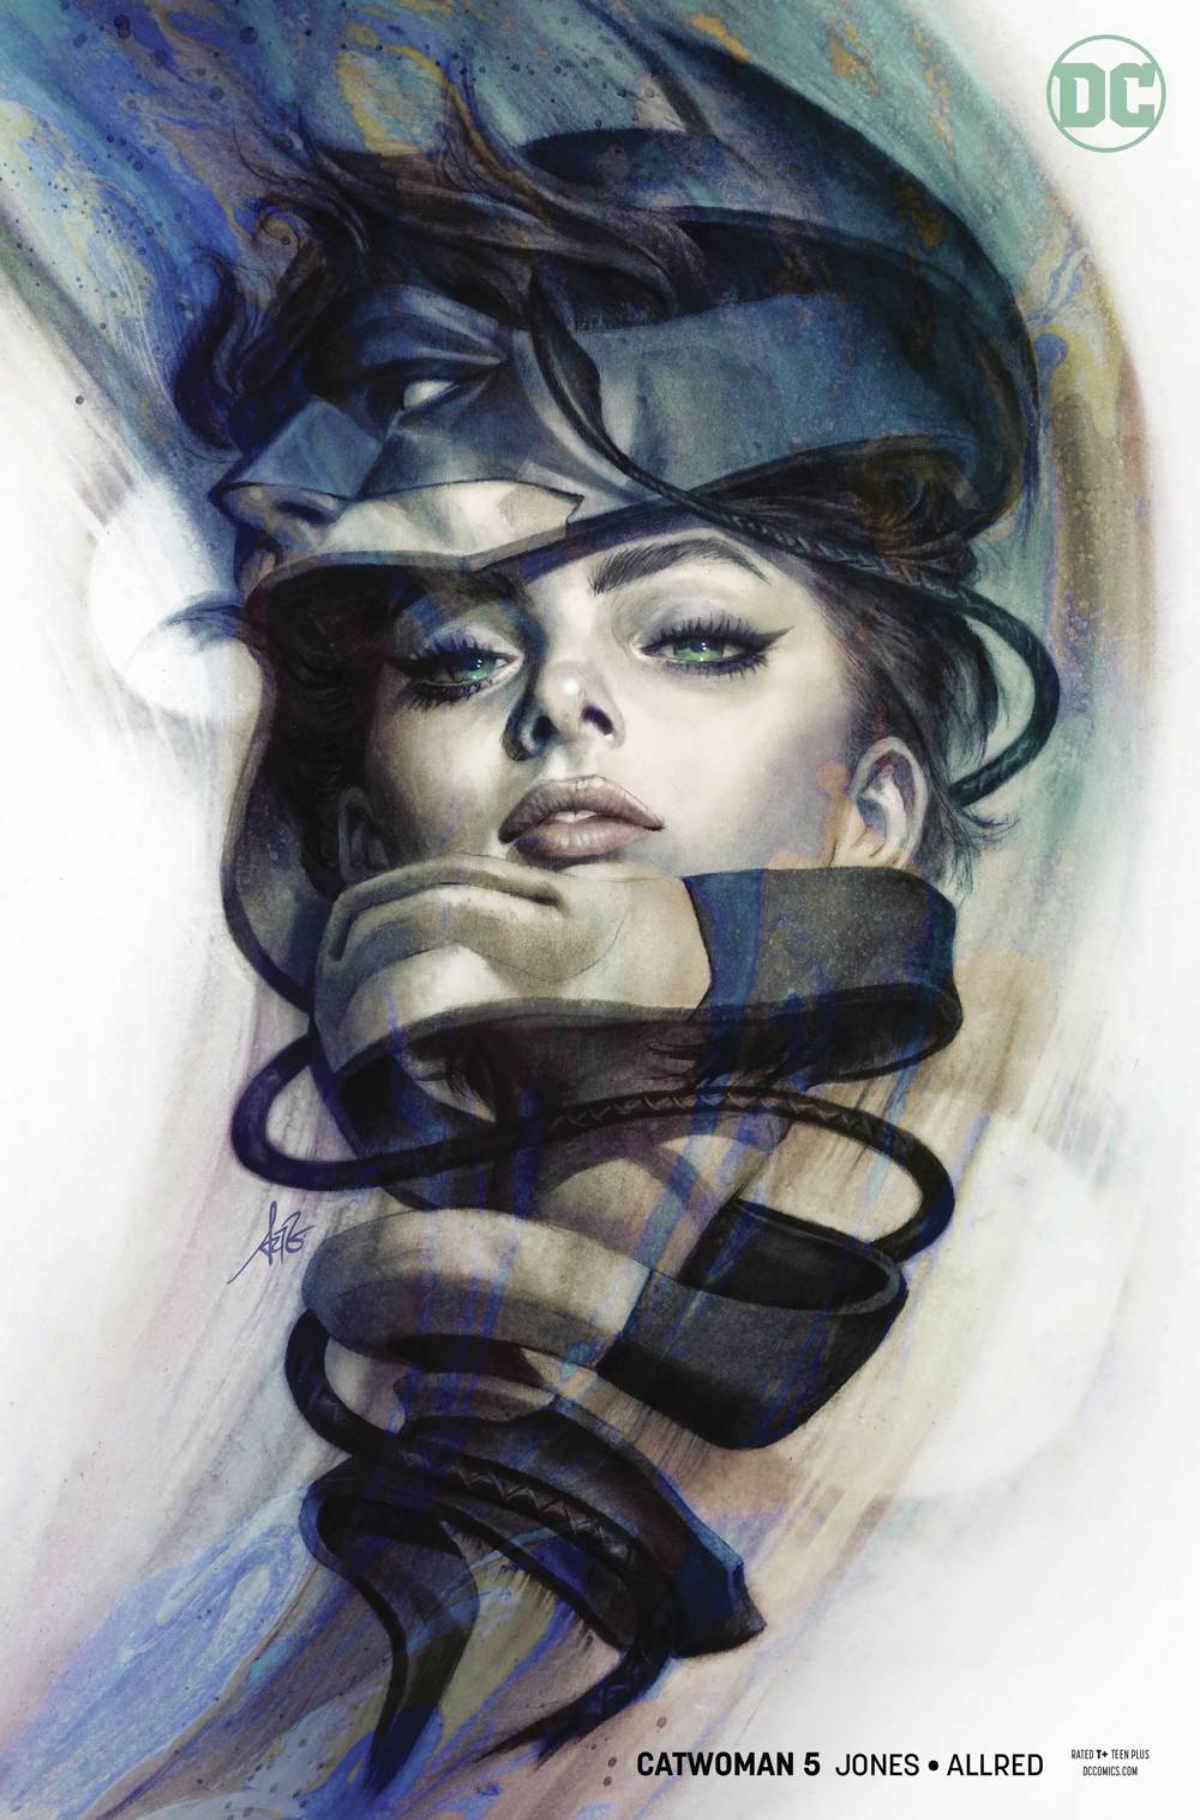 Catwoman #5 Artgerm Variant